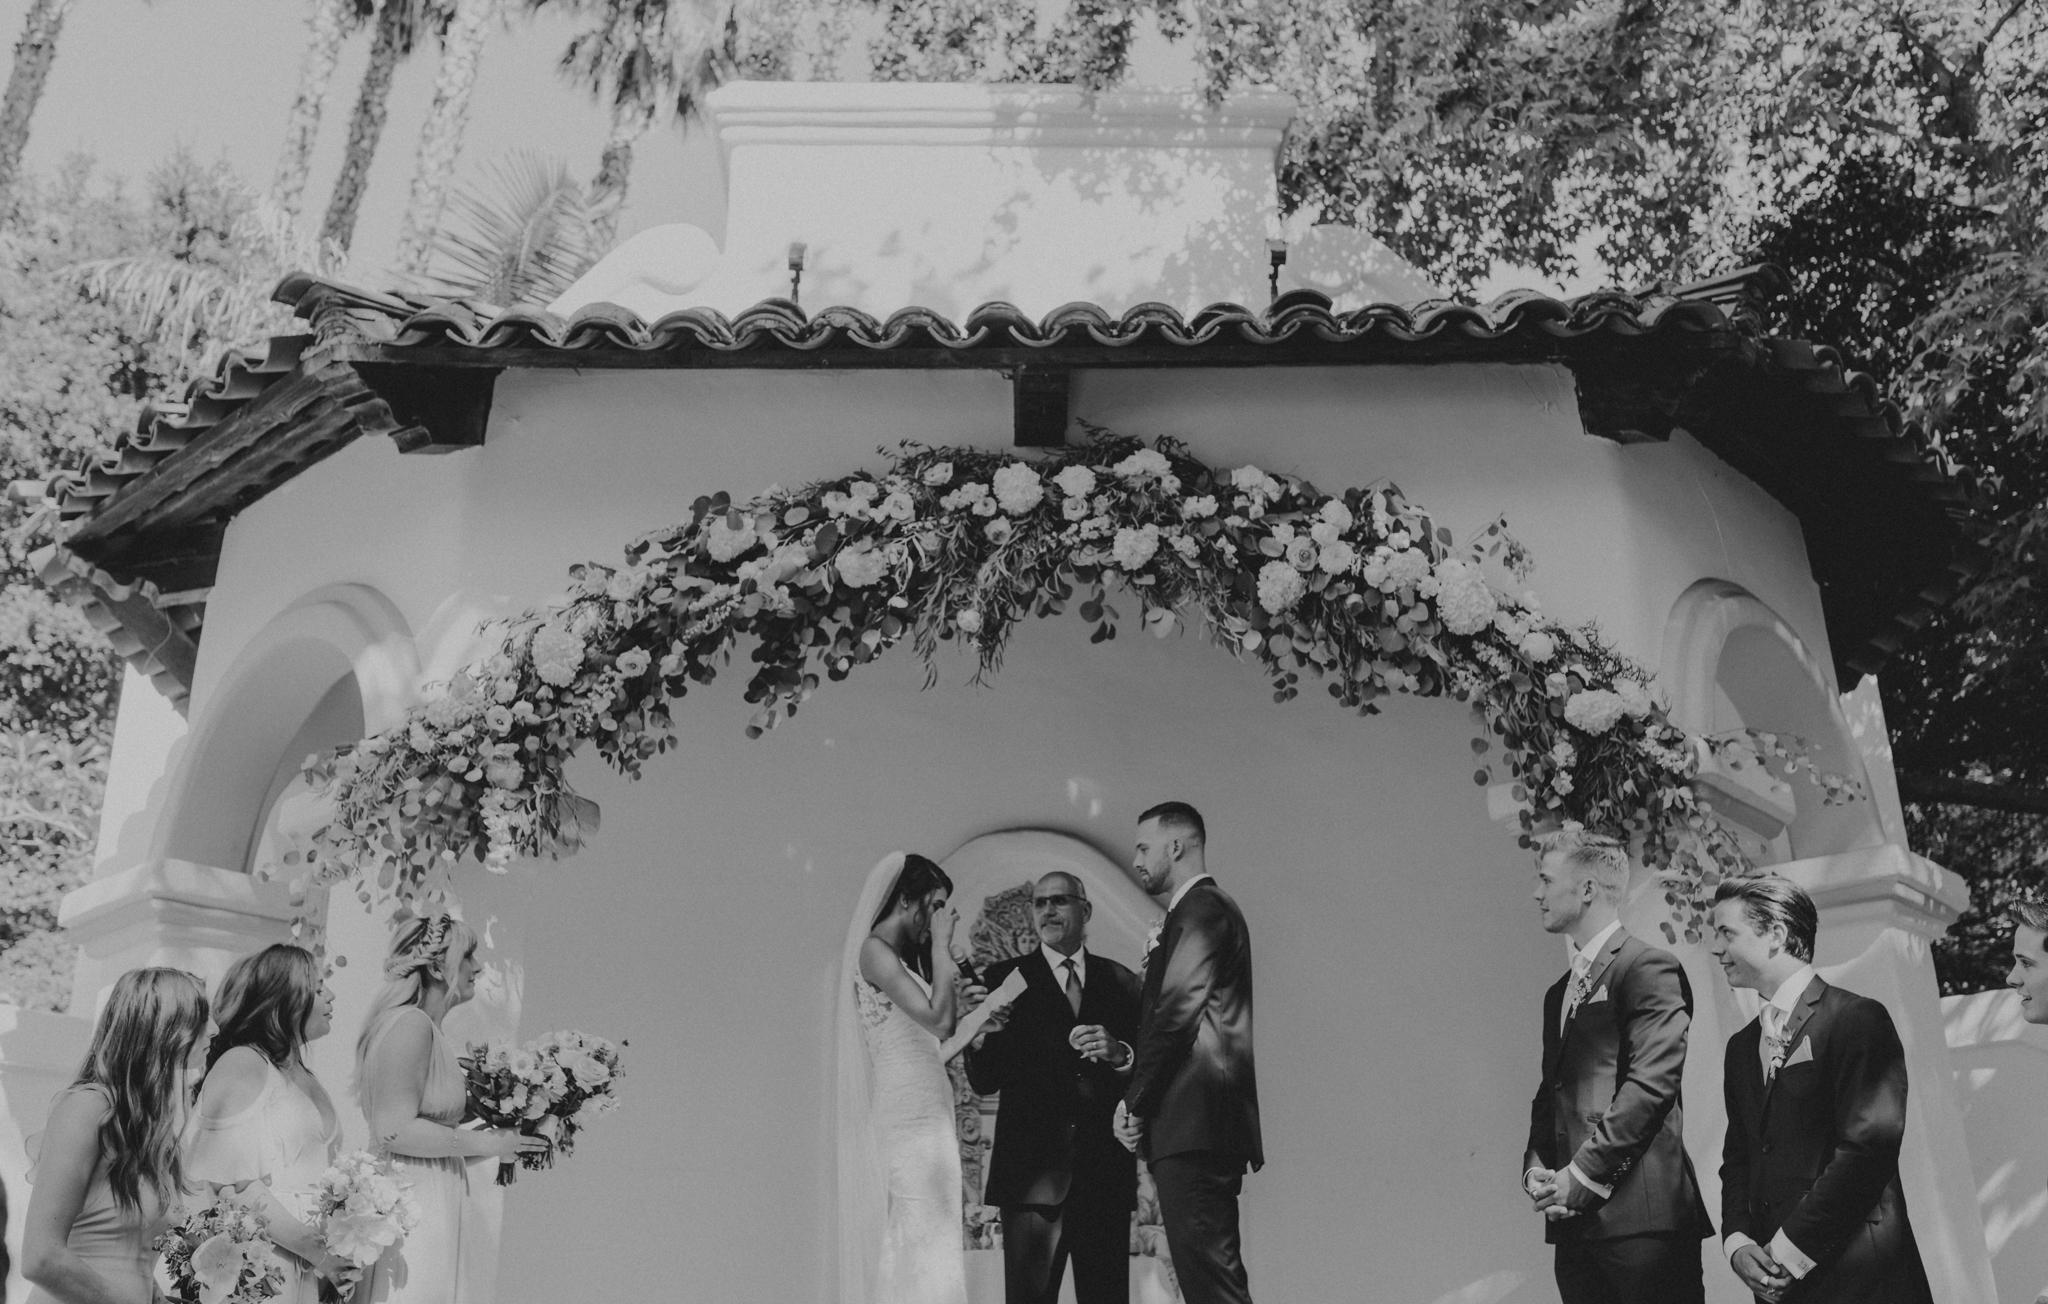 Isaiah + Taylor Photography - Rancho Las Lomas Wedding, Los Angeles Wedding Photographer-050.jpg